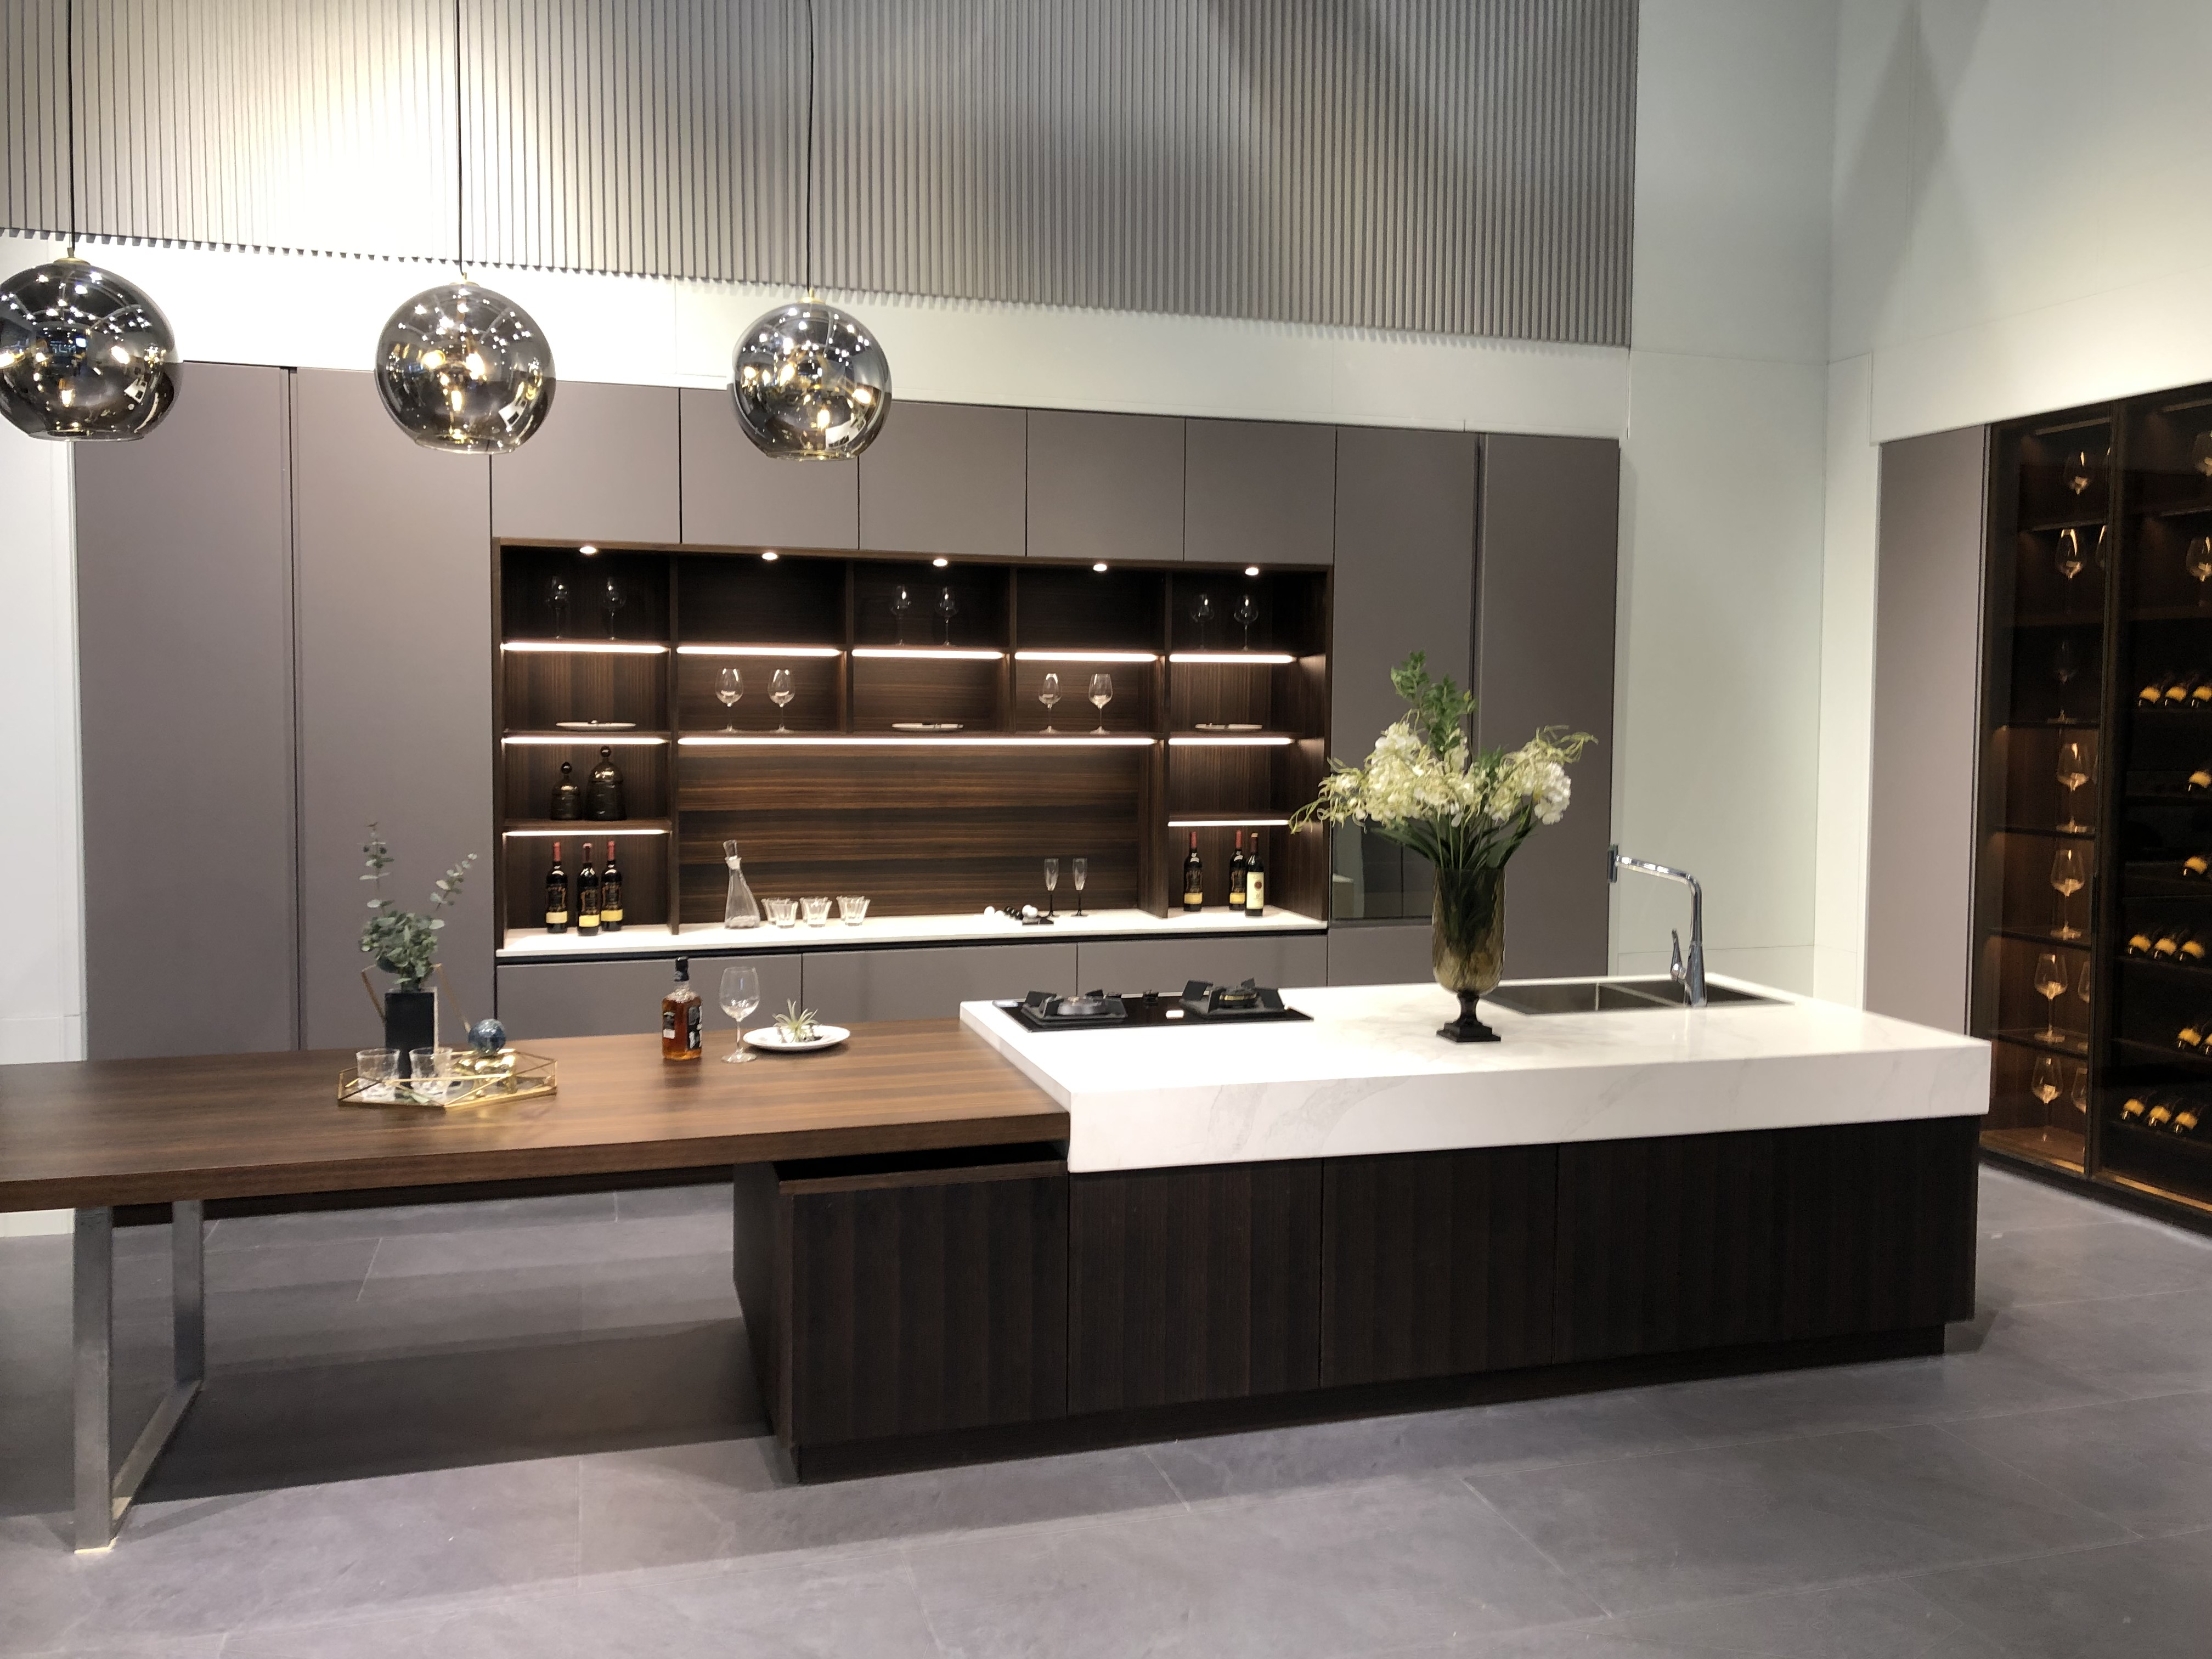 2020 Discountable Price Modern Design Wooden Customized Design Kitchen Cabinet Island Cabinet Kitchen Cabinets Aliexpress